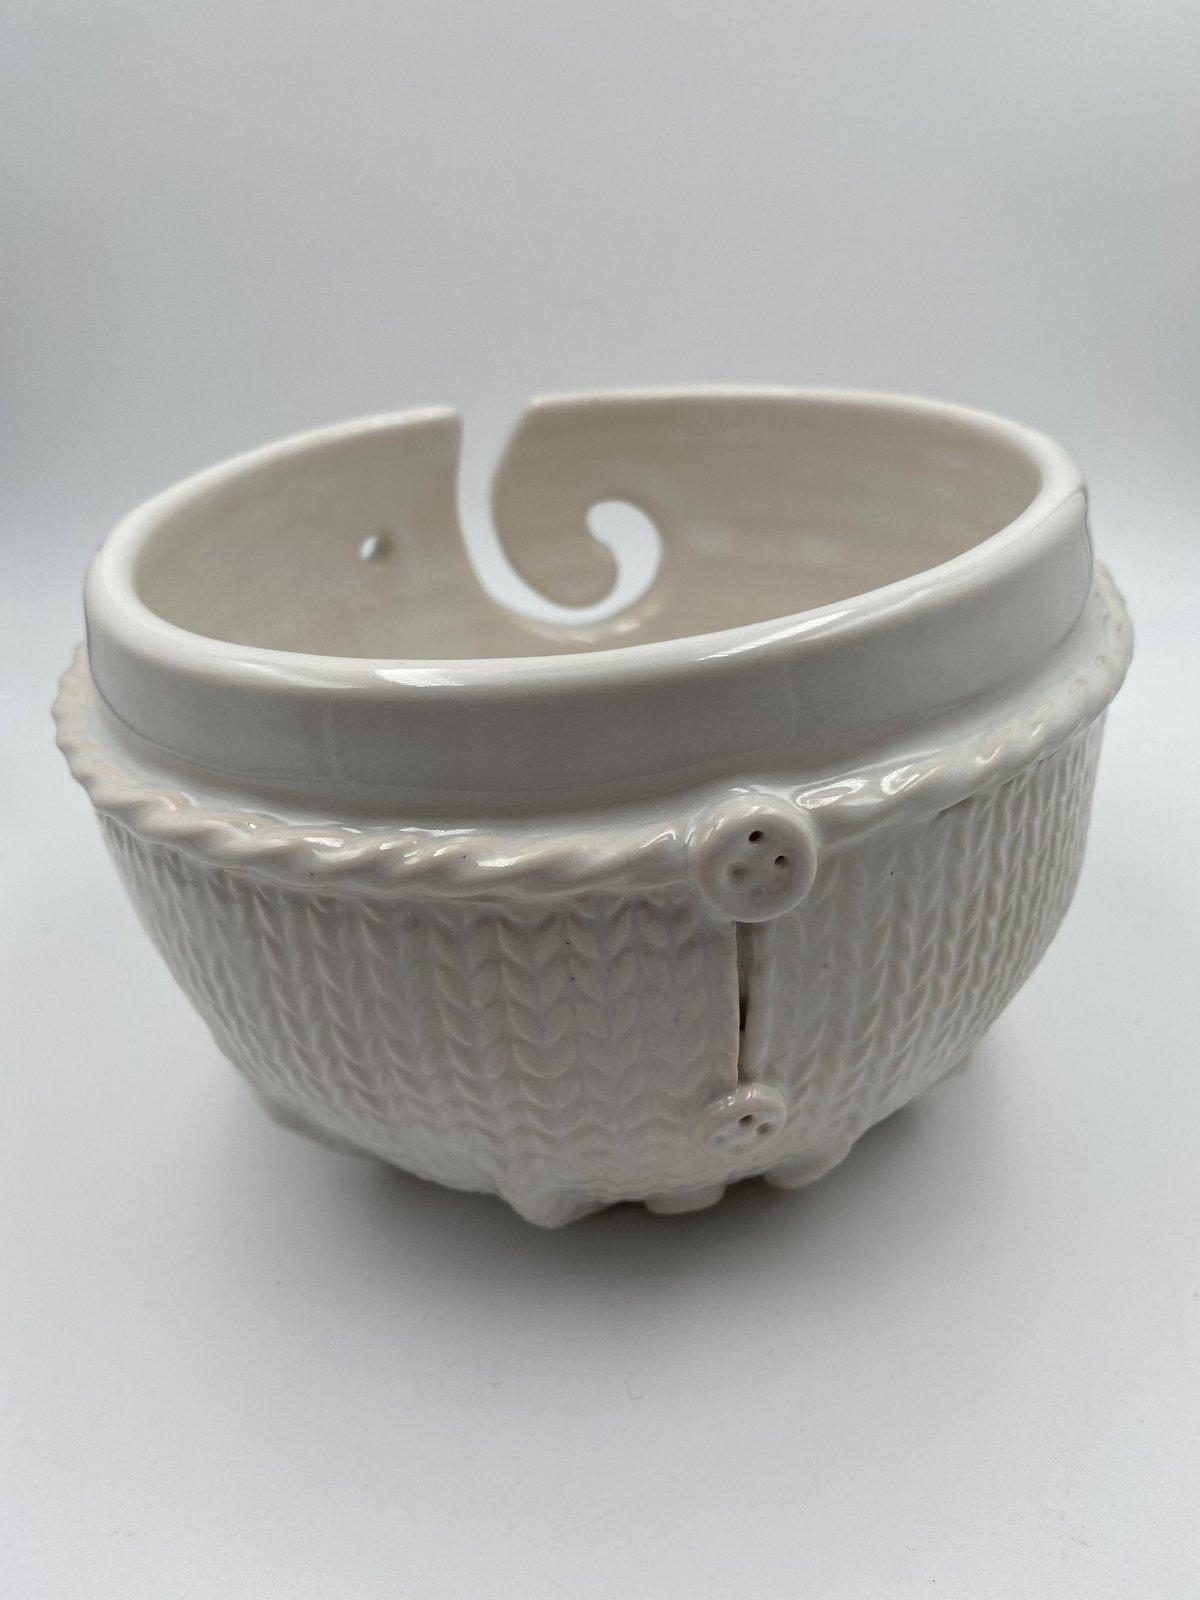 Pawley Yarn Bowl - Sweater